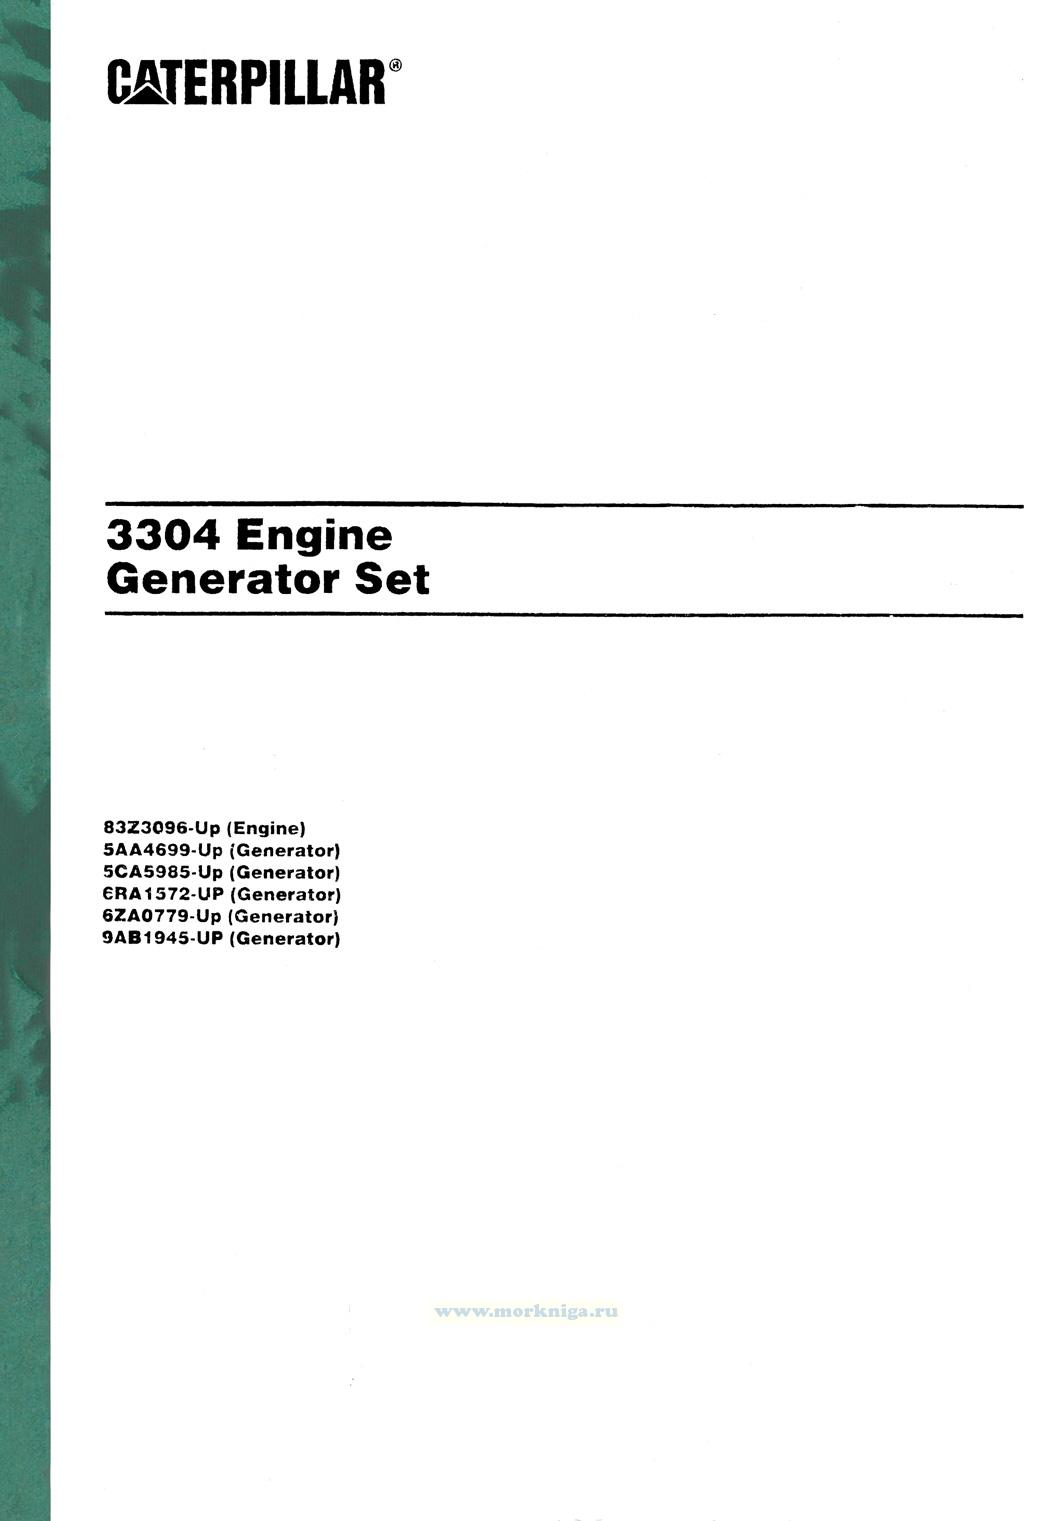 3304 Engin Generator Set. 83Z3096-Up (Engine), 5FF4699-UP (Generator), 5CA5985-Up (Generator), 6RA1572-Up (Generator), 6ZA0779-Up (Generator), 9AB1945-Up (Generator)